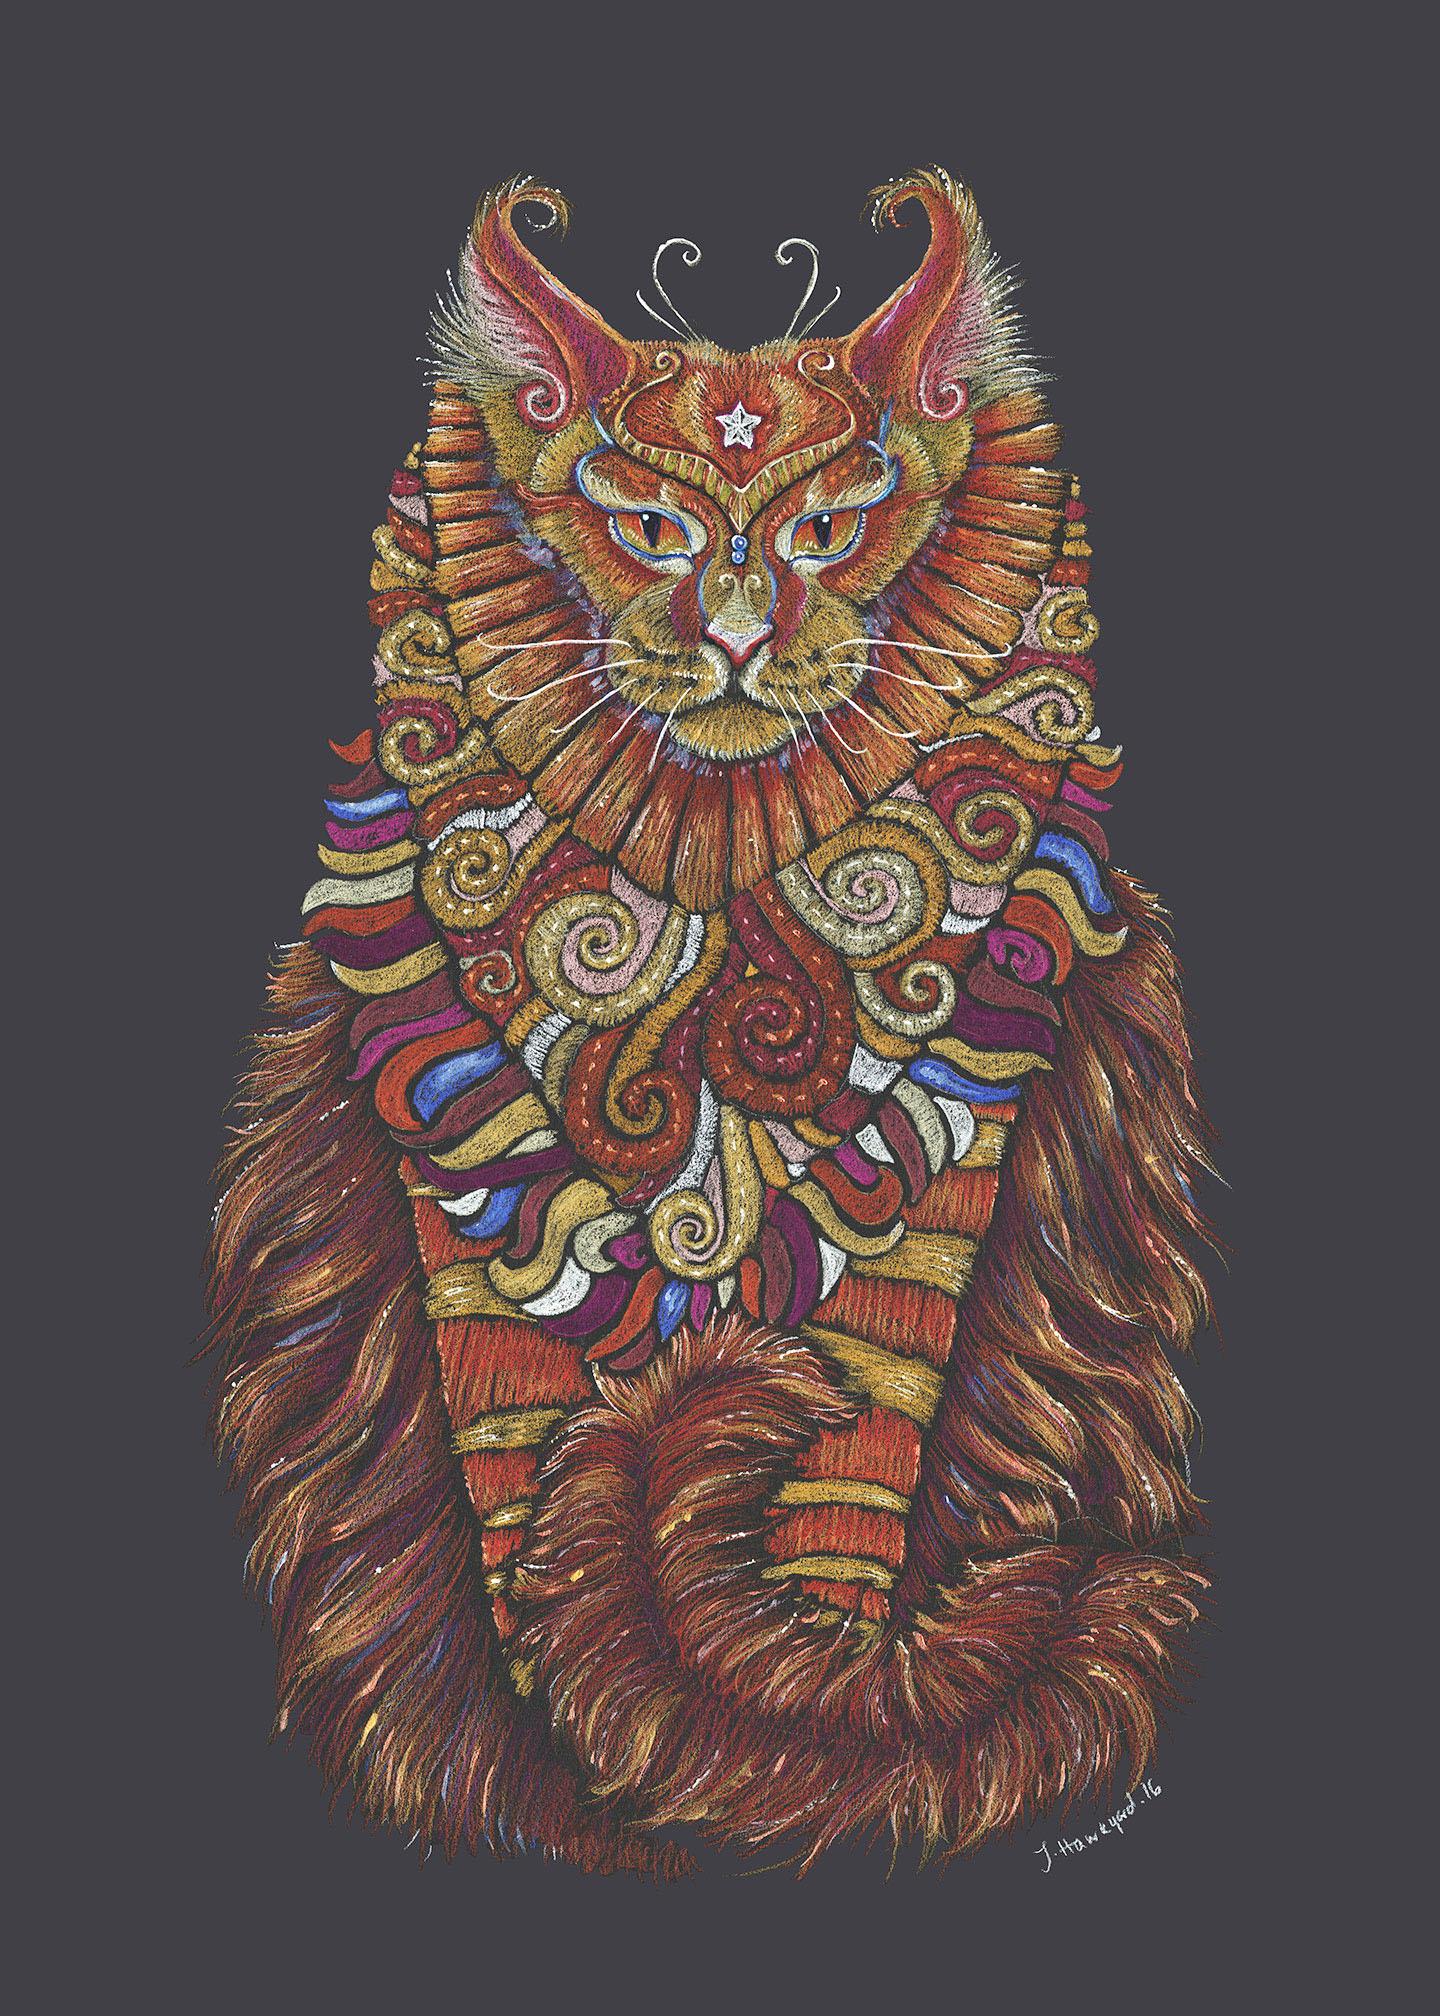 Maine Coon Cat Totem image